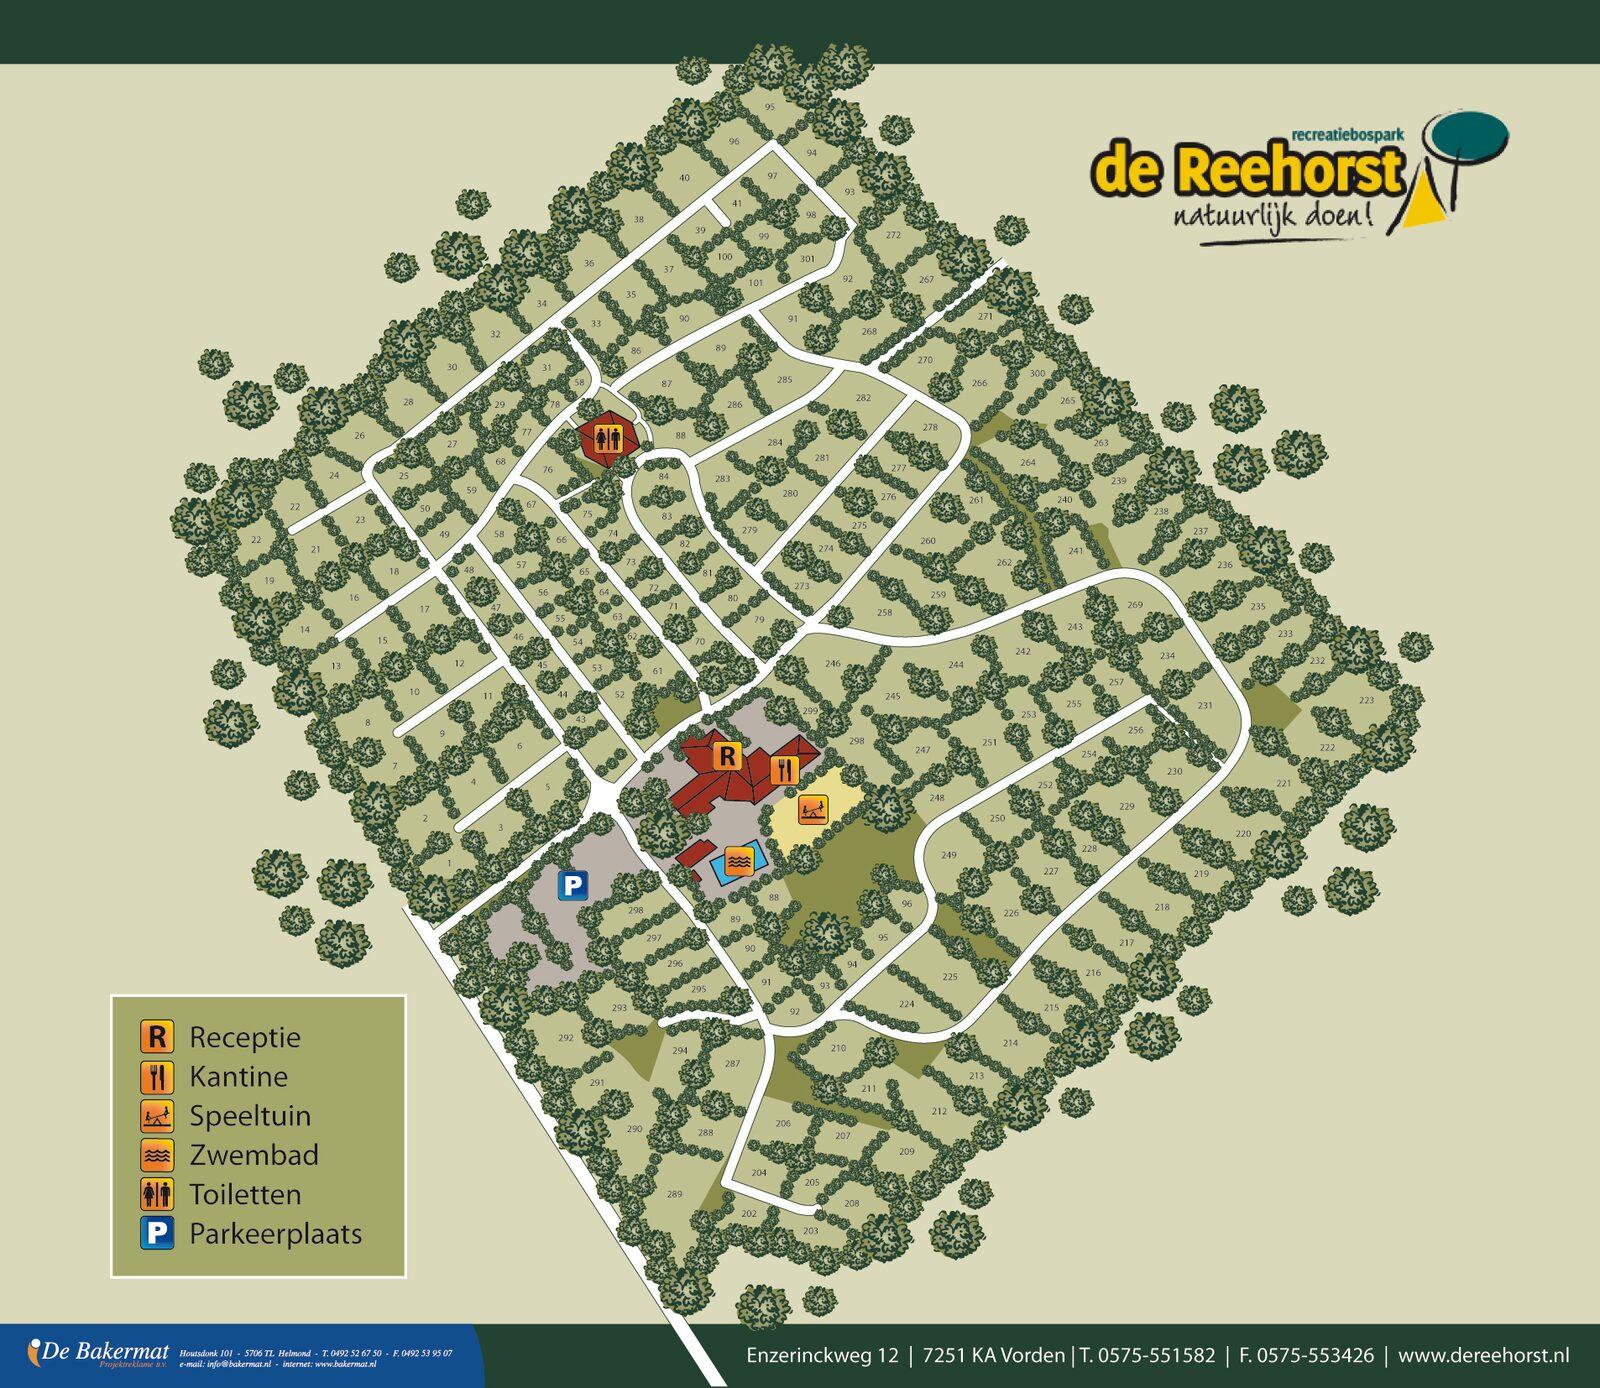 Plattegrond Recreatiebospark de Reehorst